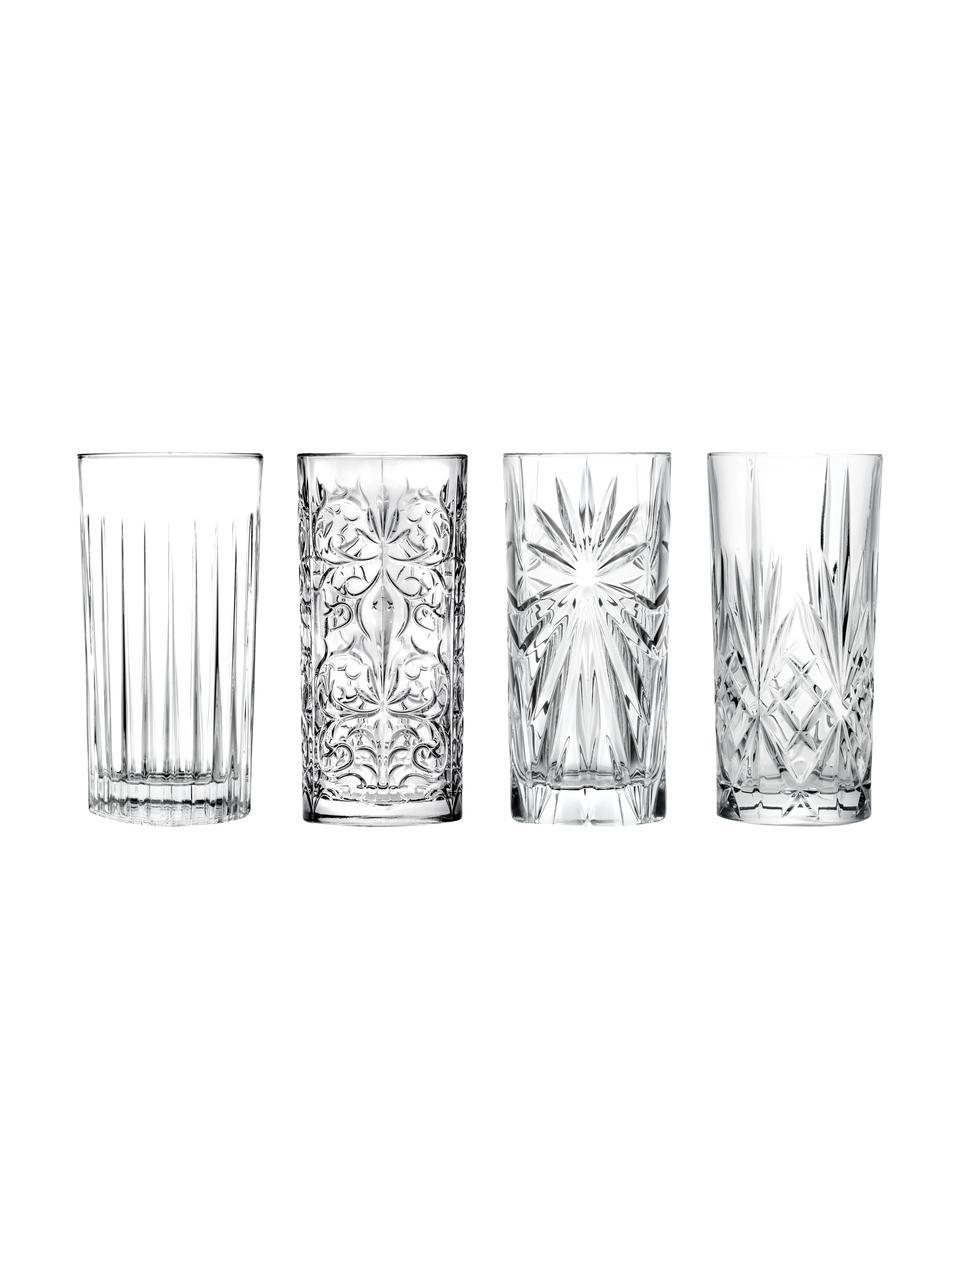 Kristallen longdrinkglazen Bichiera met reliëf, 4-delig, Kristalglas, Transparant, Ø 8 x H 15 cm